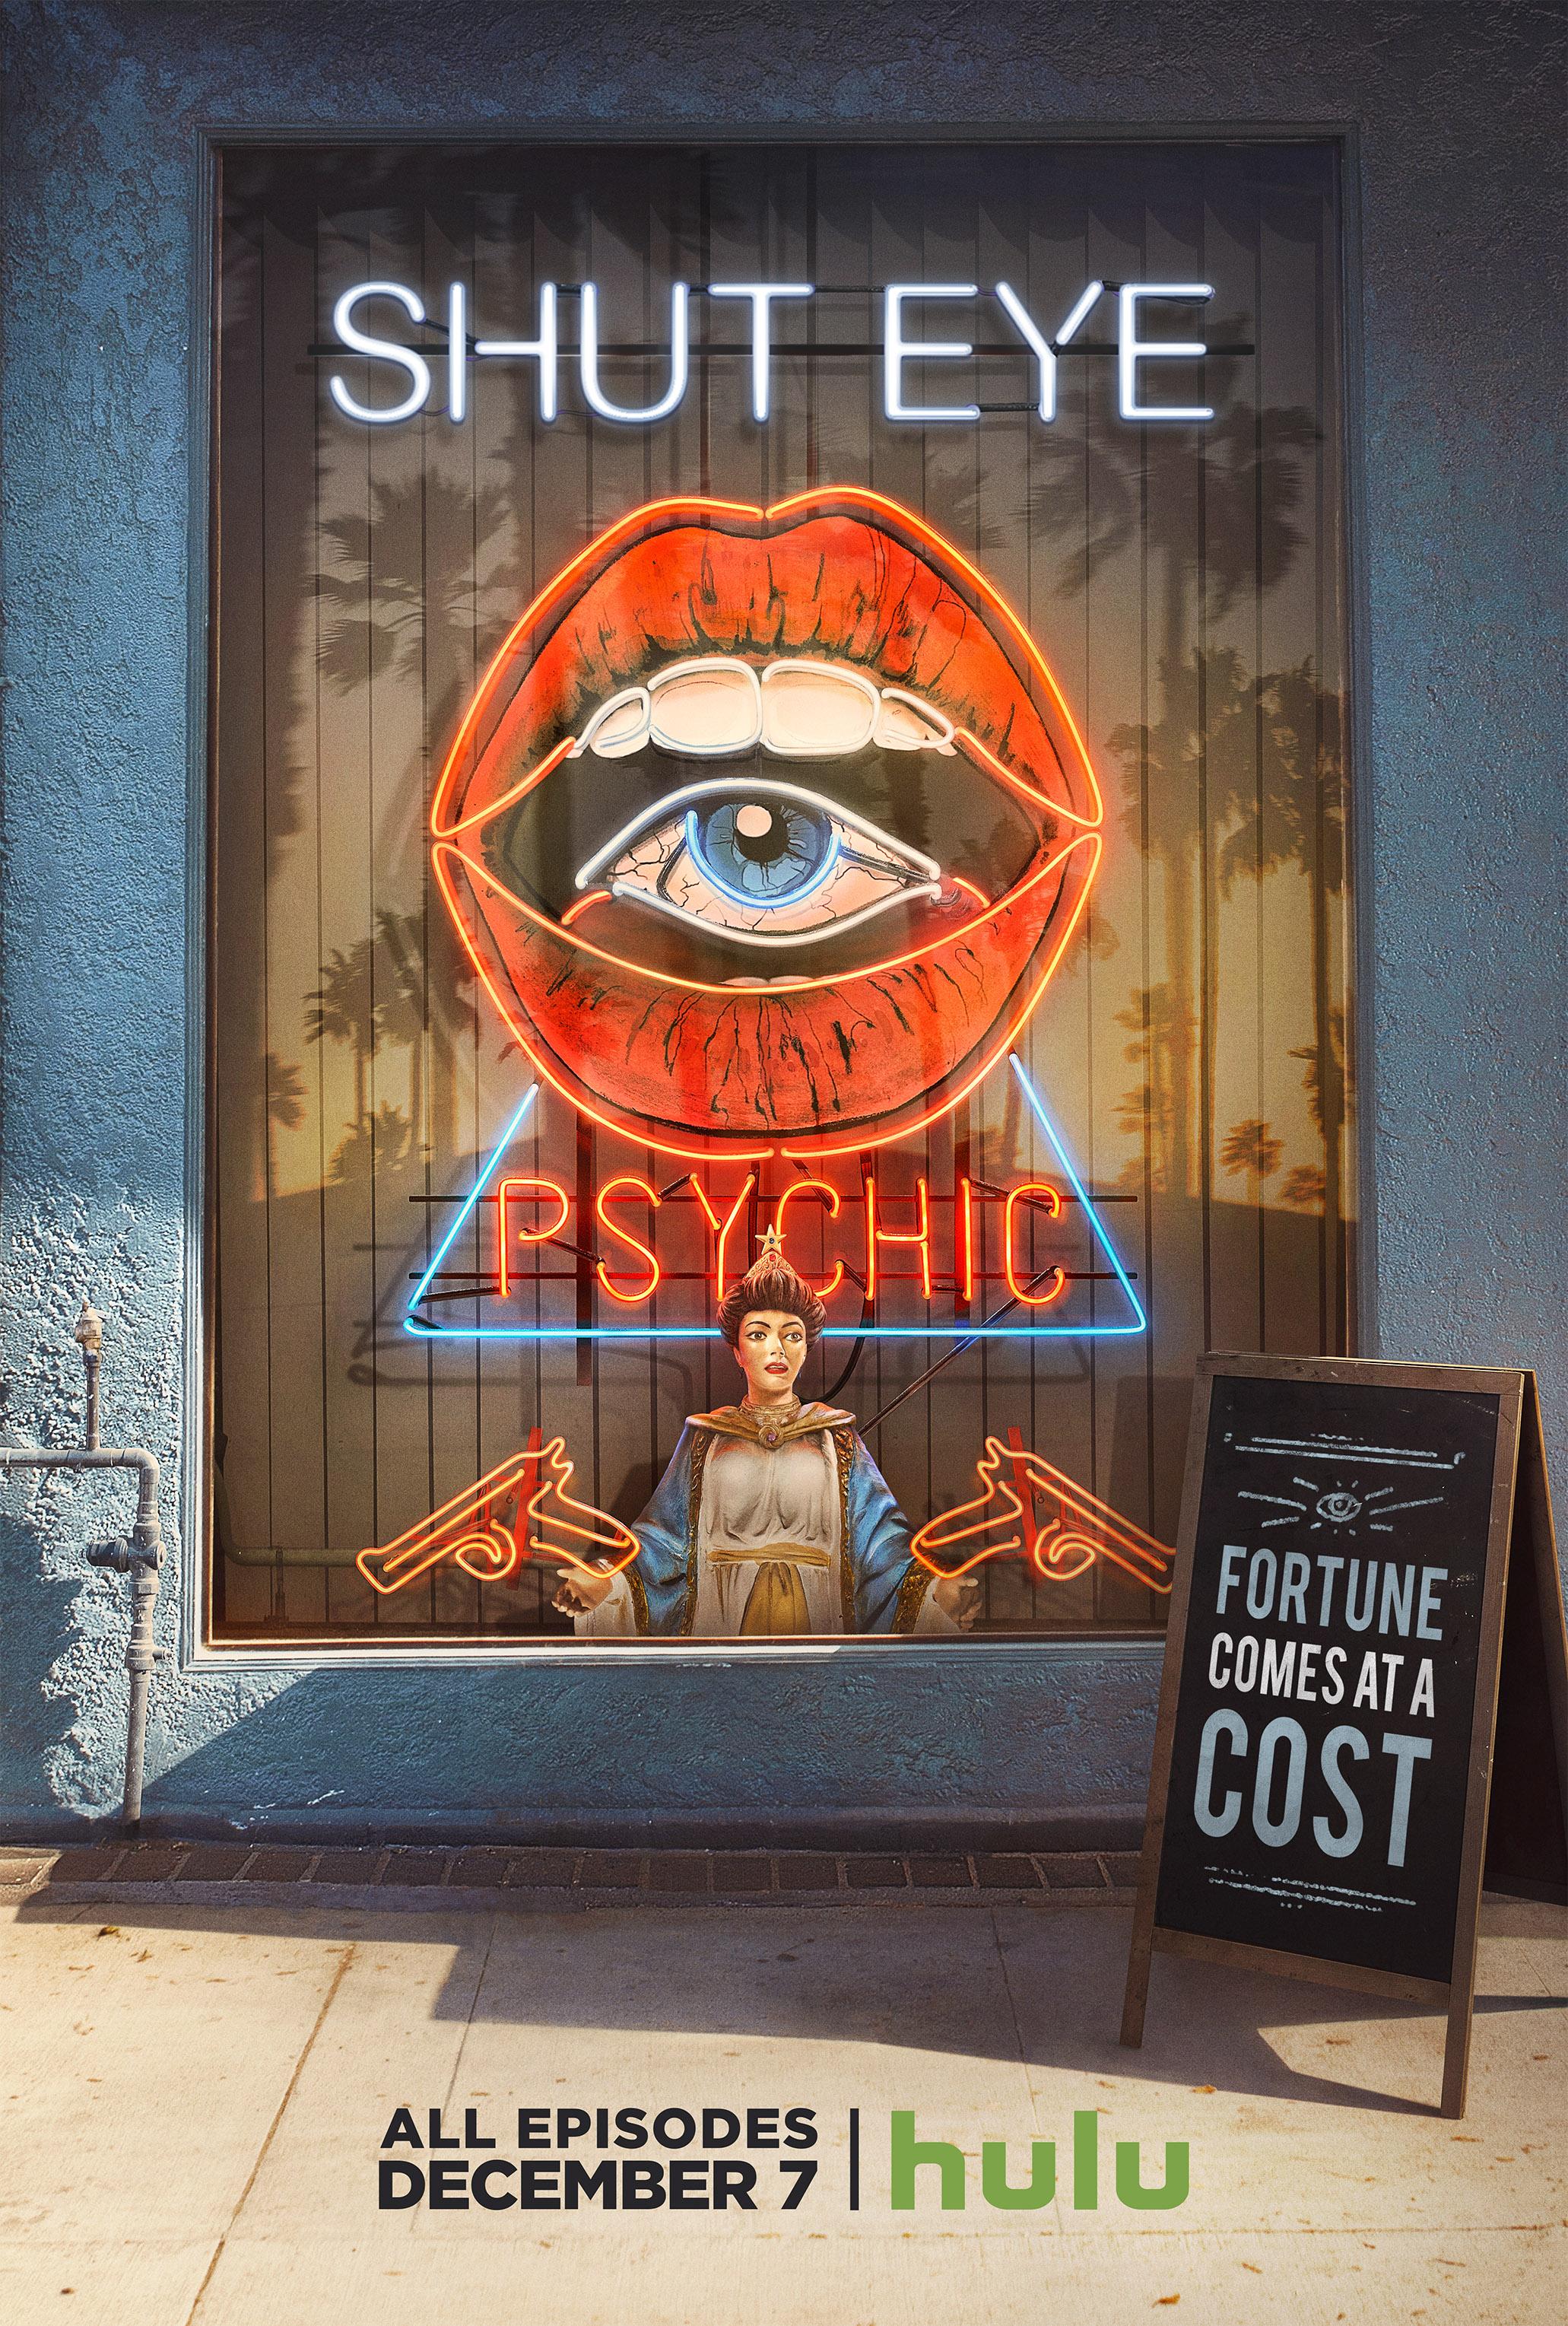 Shut Eye Poster Hulus New Series Follows Los Angeles Psychic